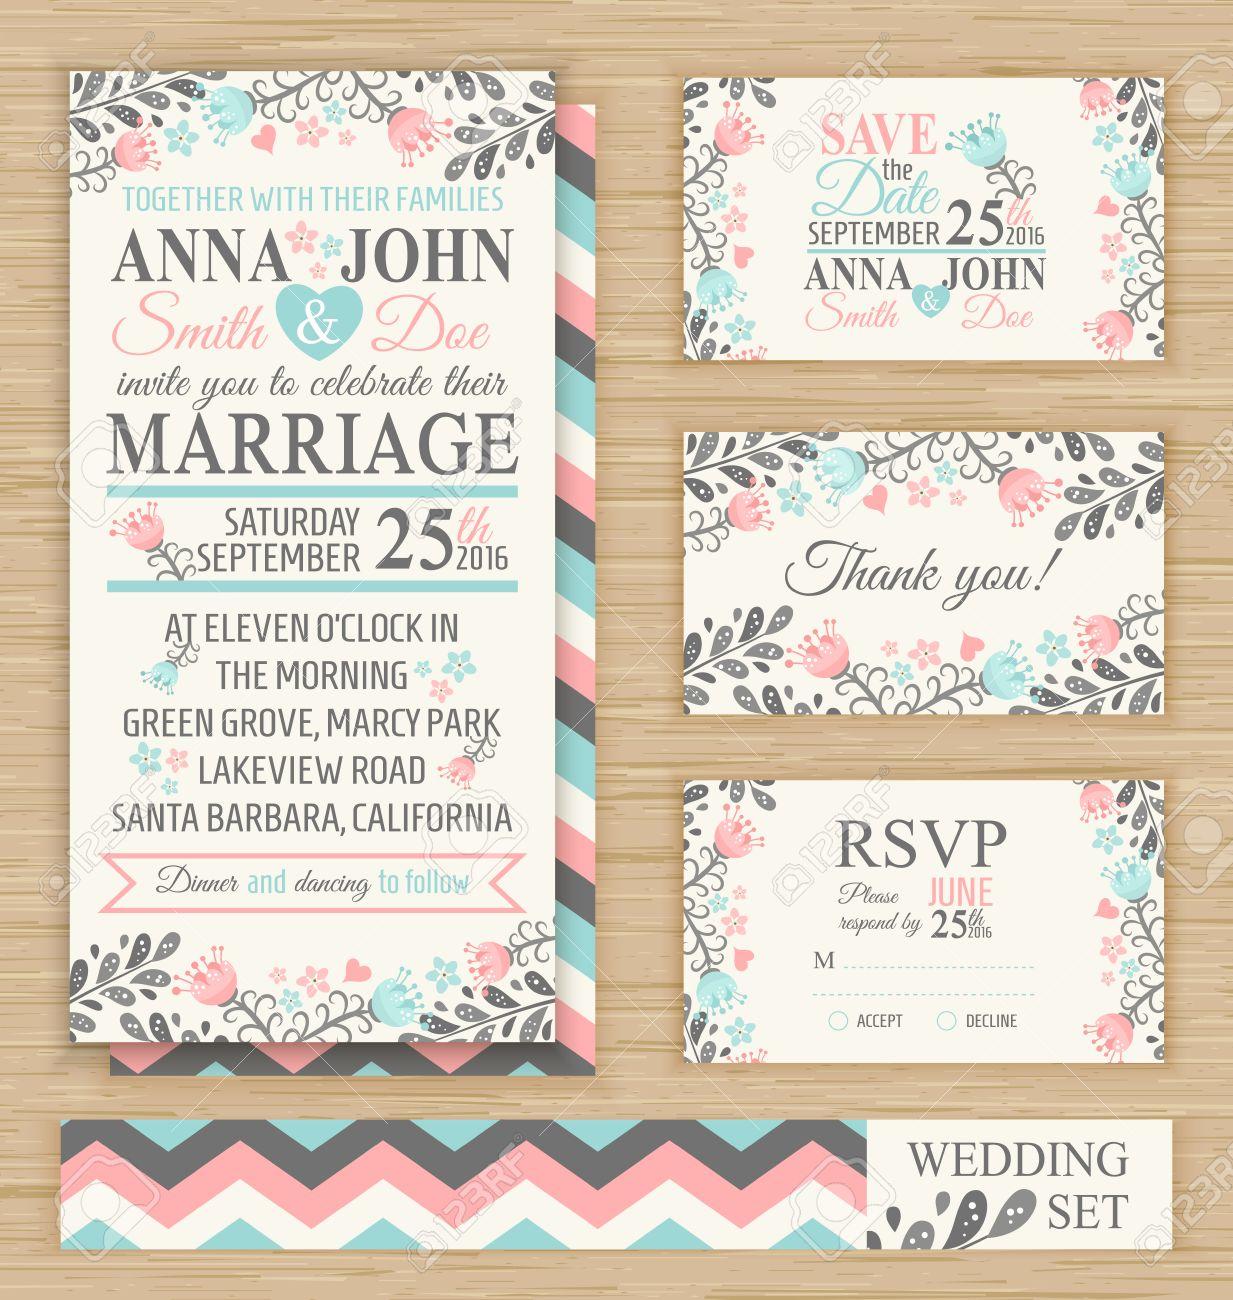 Wedding Invitation Template Thank You Card Save The Date RSVP – Thank You Cards Wedding Template